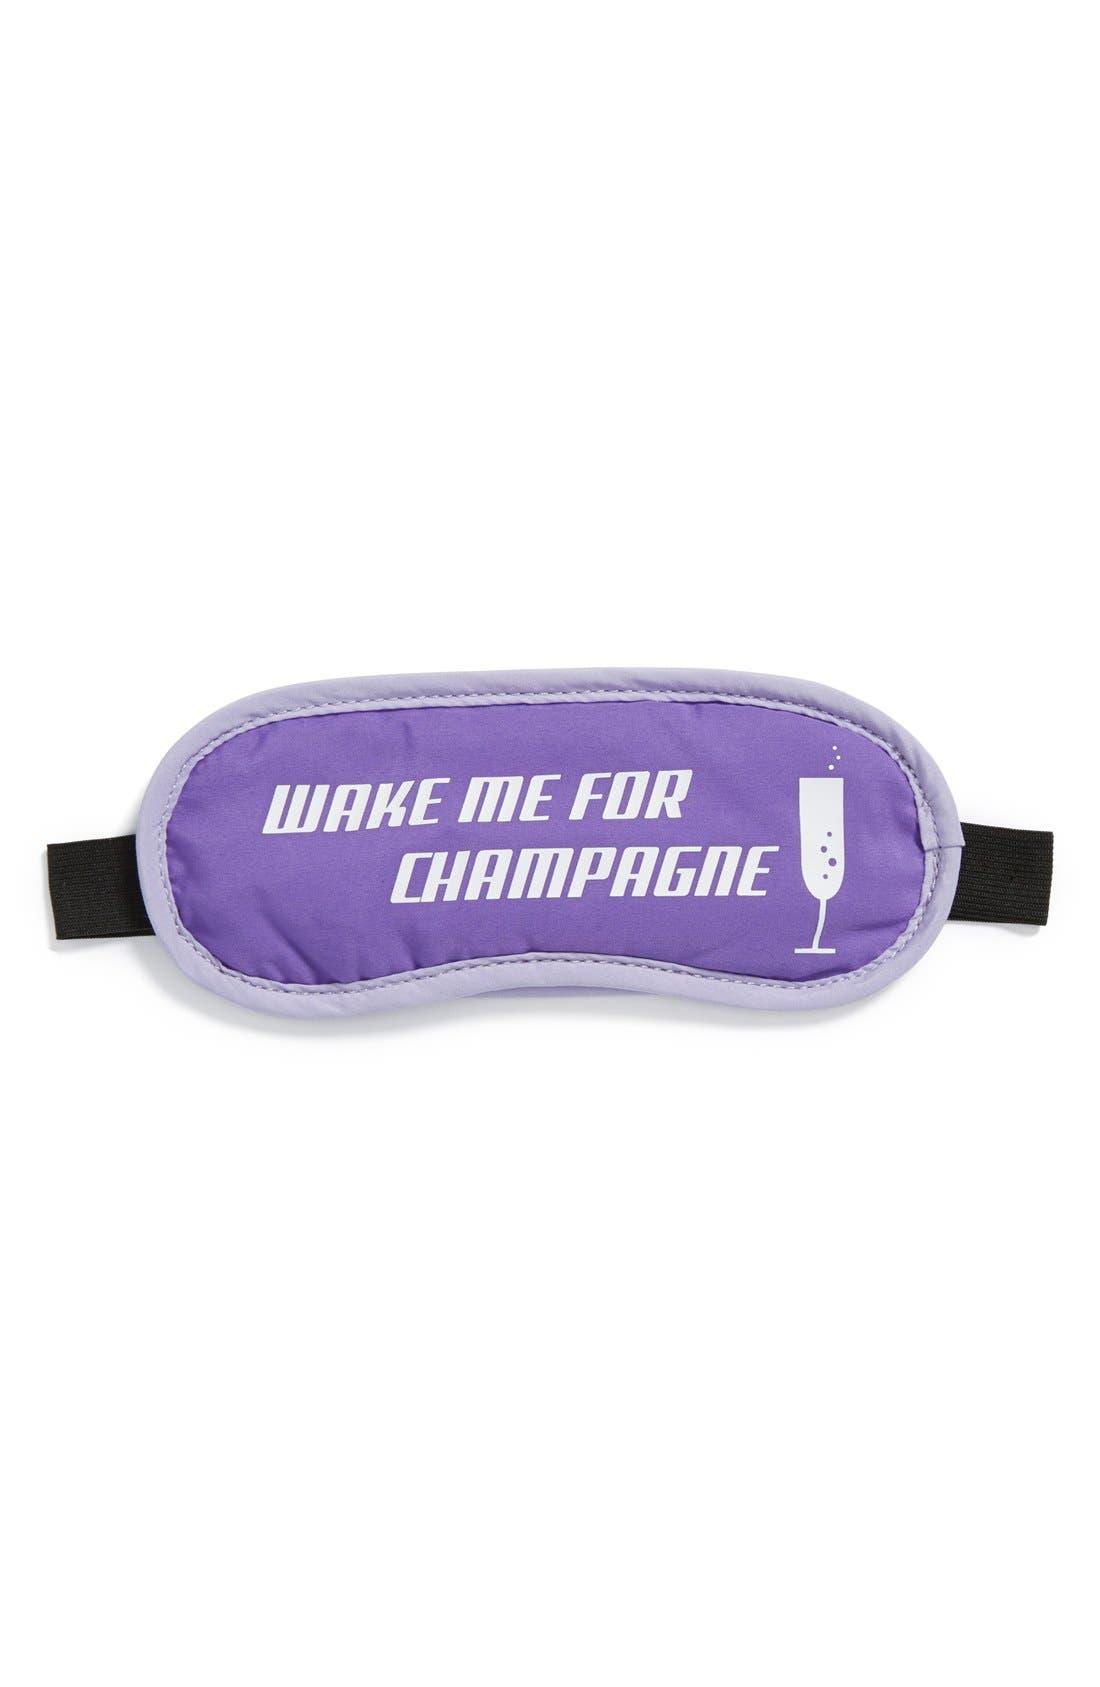 Alternate Image 1 Selected - Flight 001 'Wake Me for Champagne' Sleep Mask